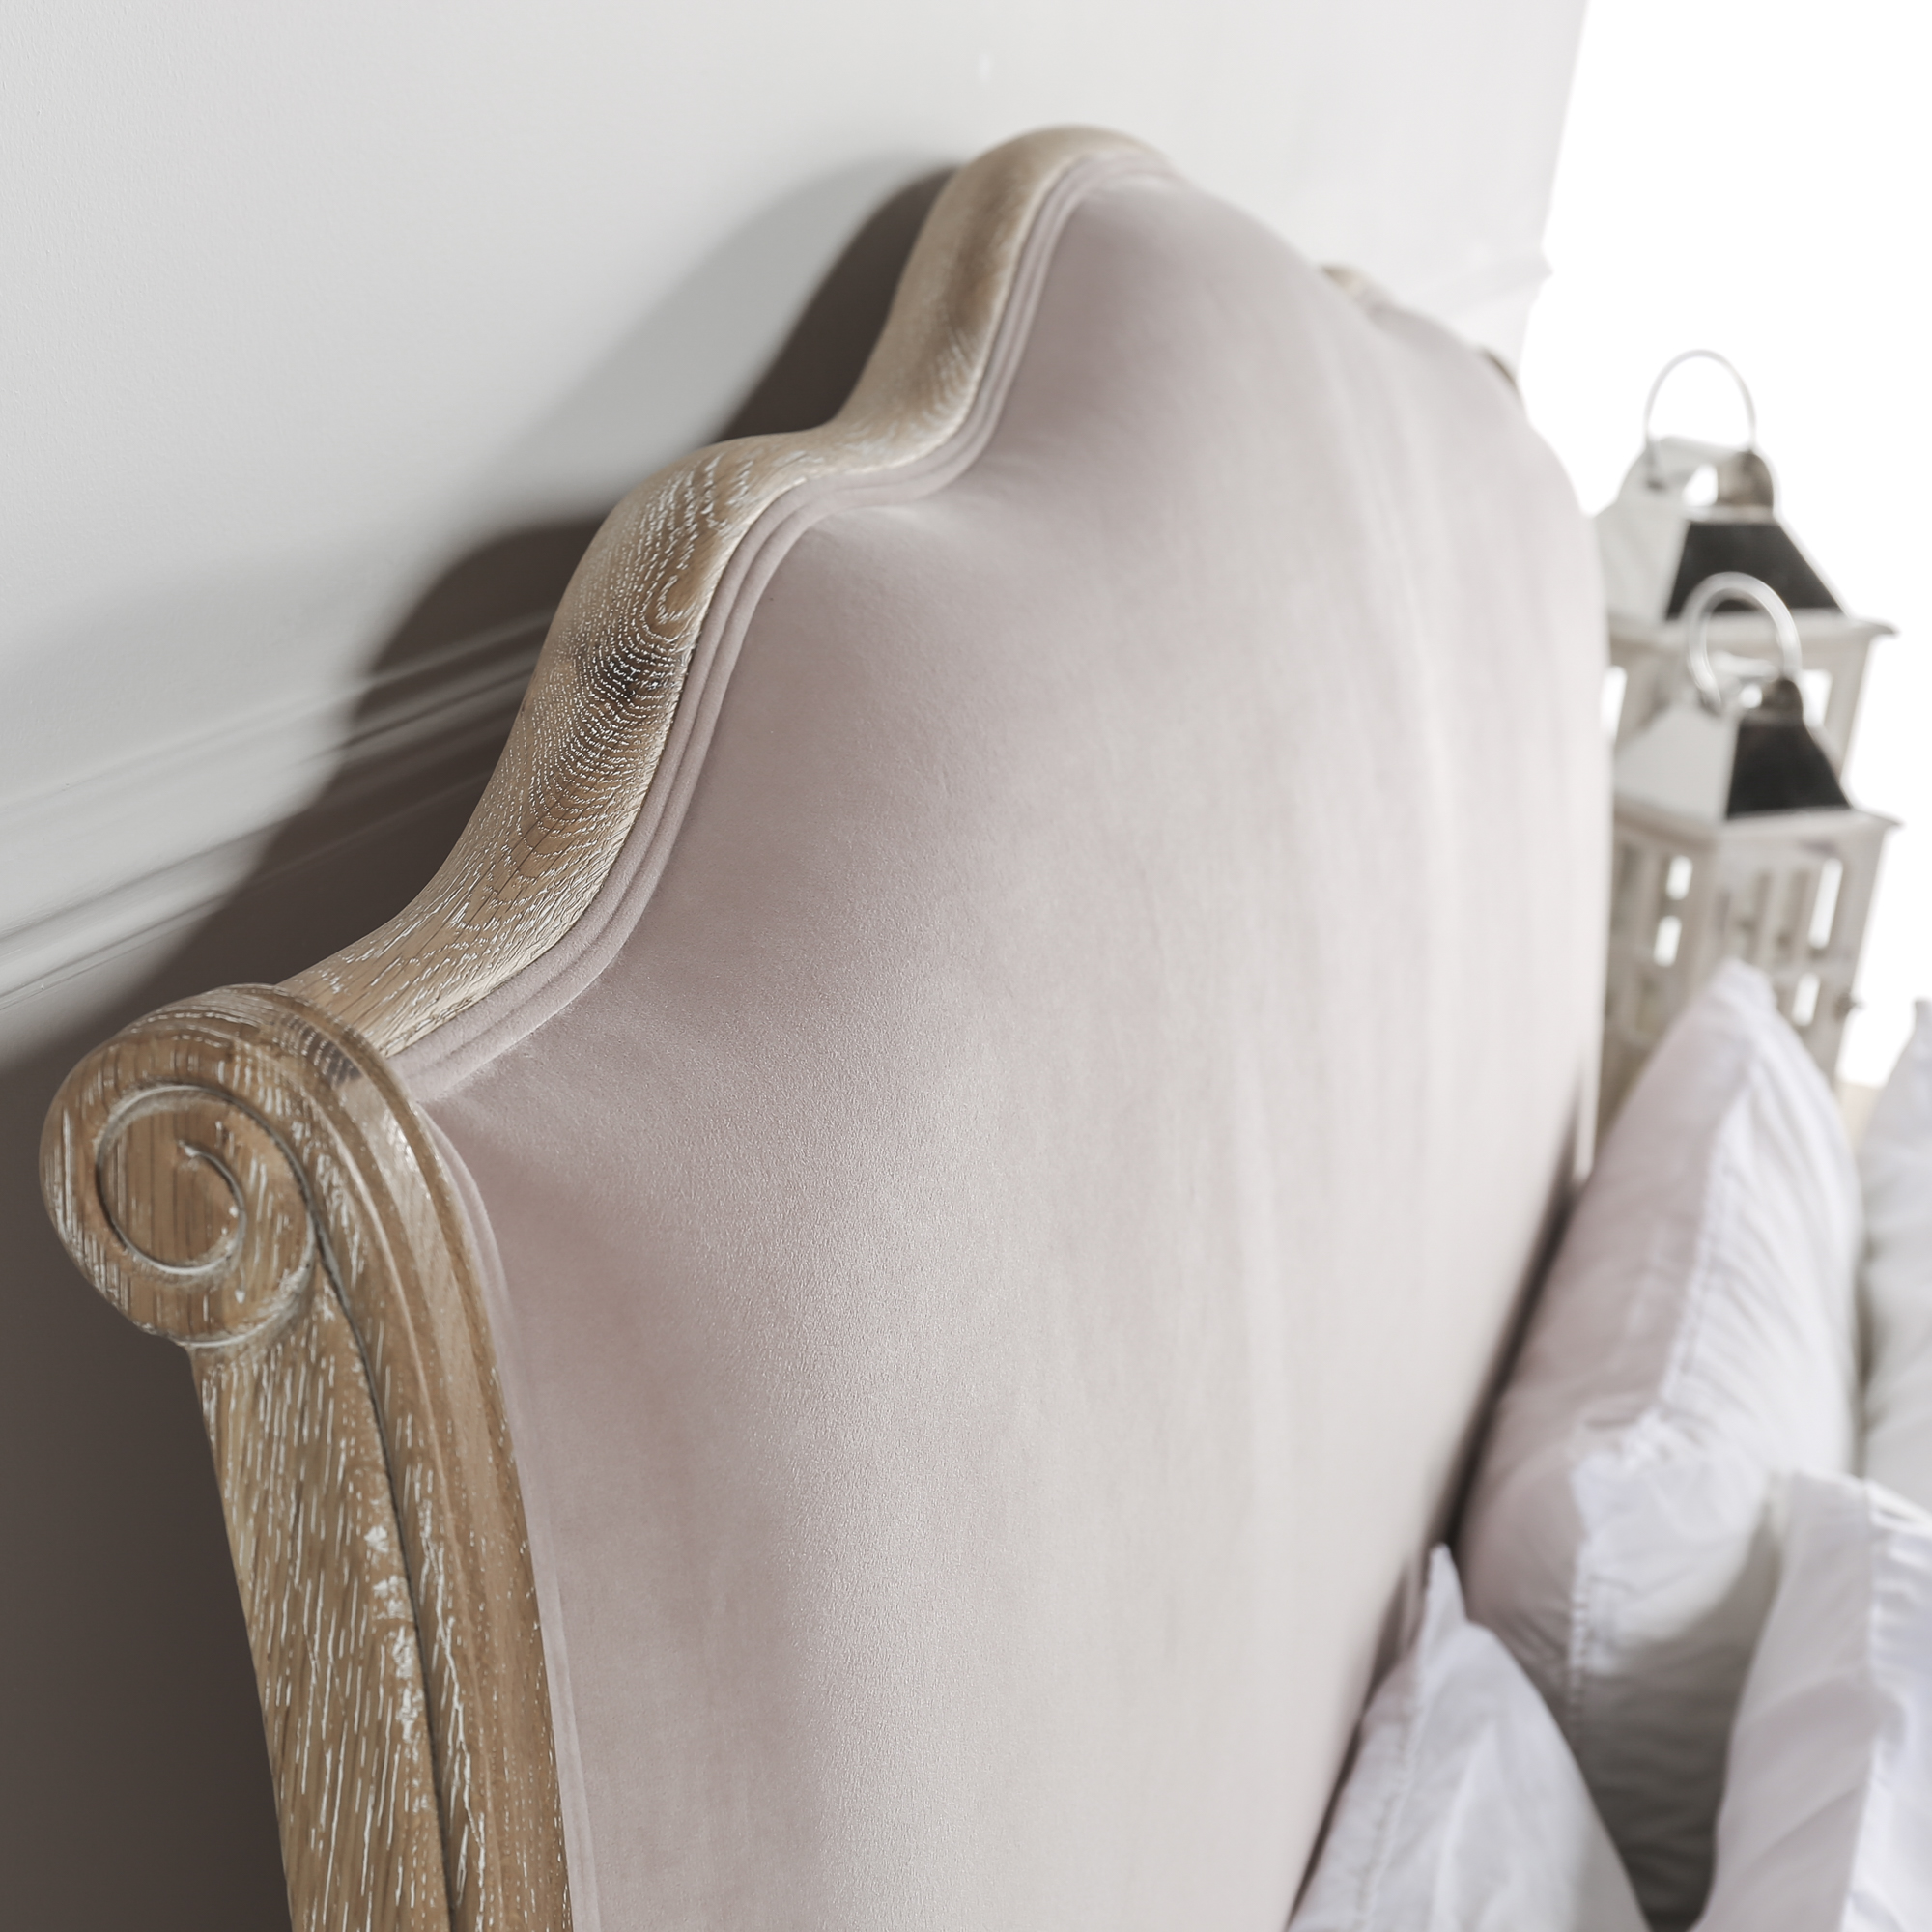 French Weathered Limed Oak Pink Brushed Velvet Upholstered Curved Bed – King Size